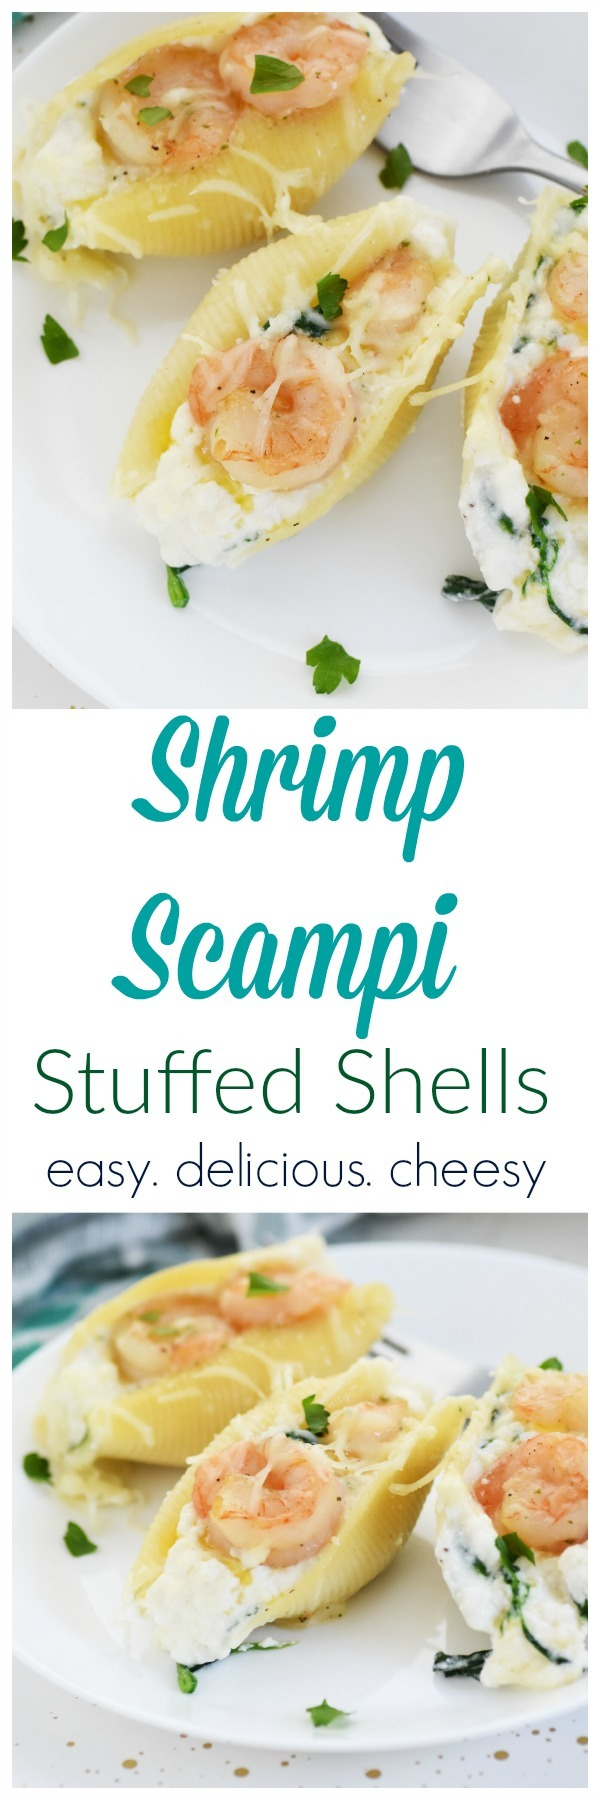 Shrimp Scampi Stuffed Shells Dinner Recipe